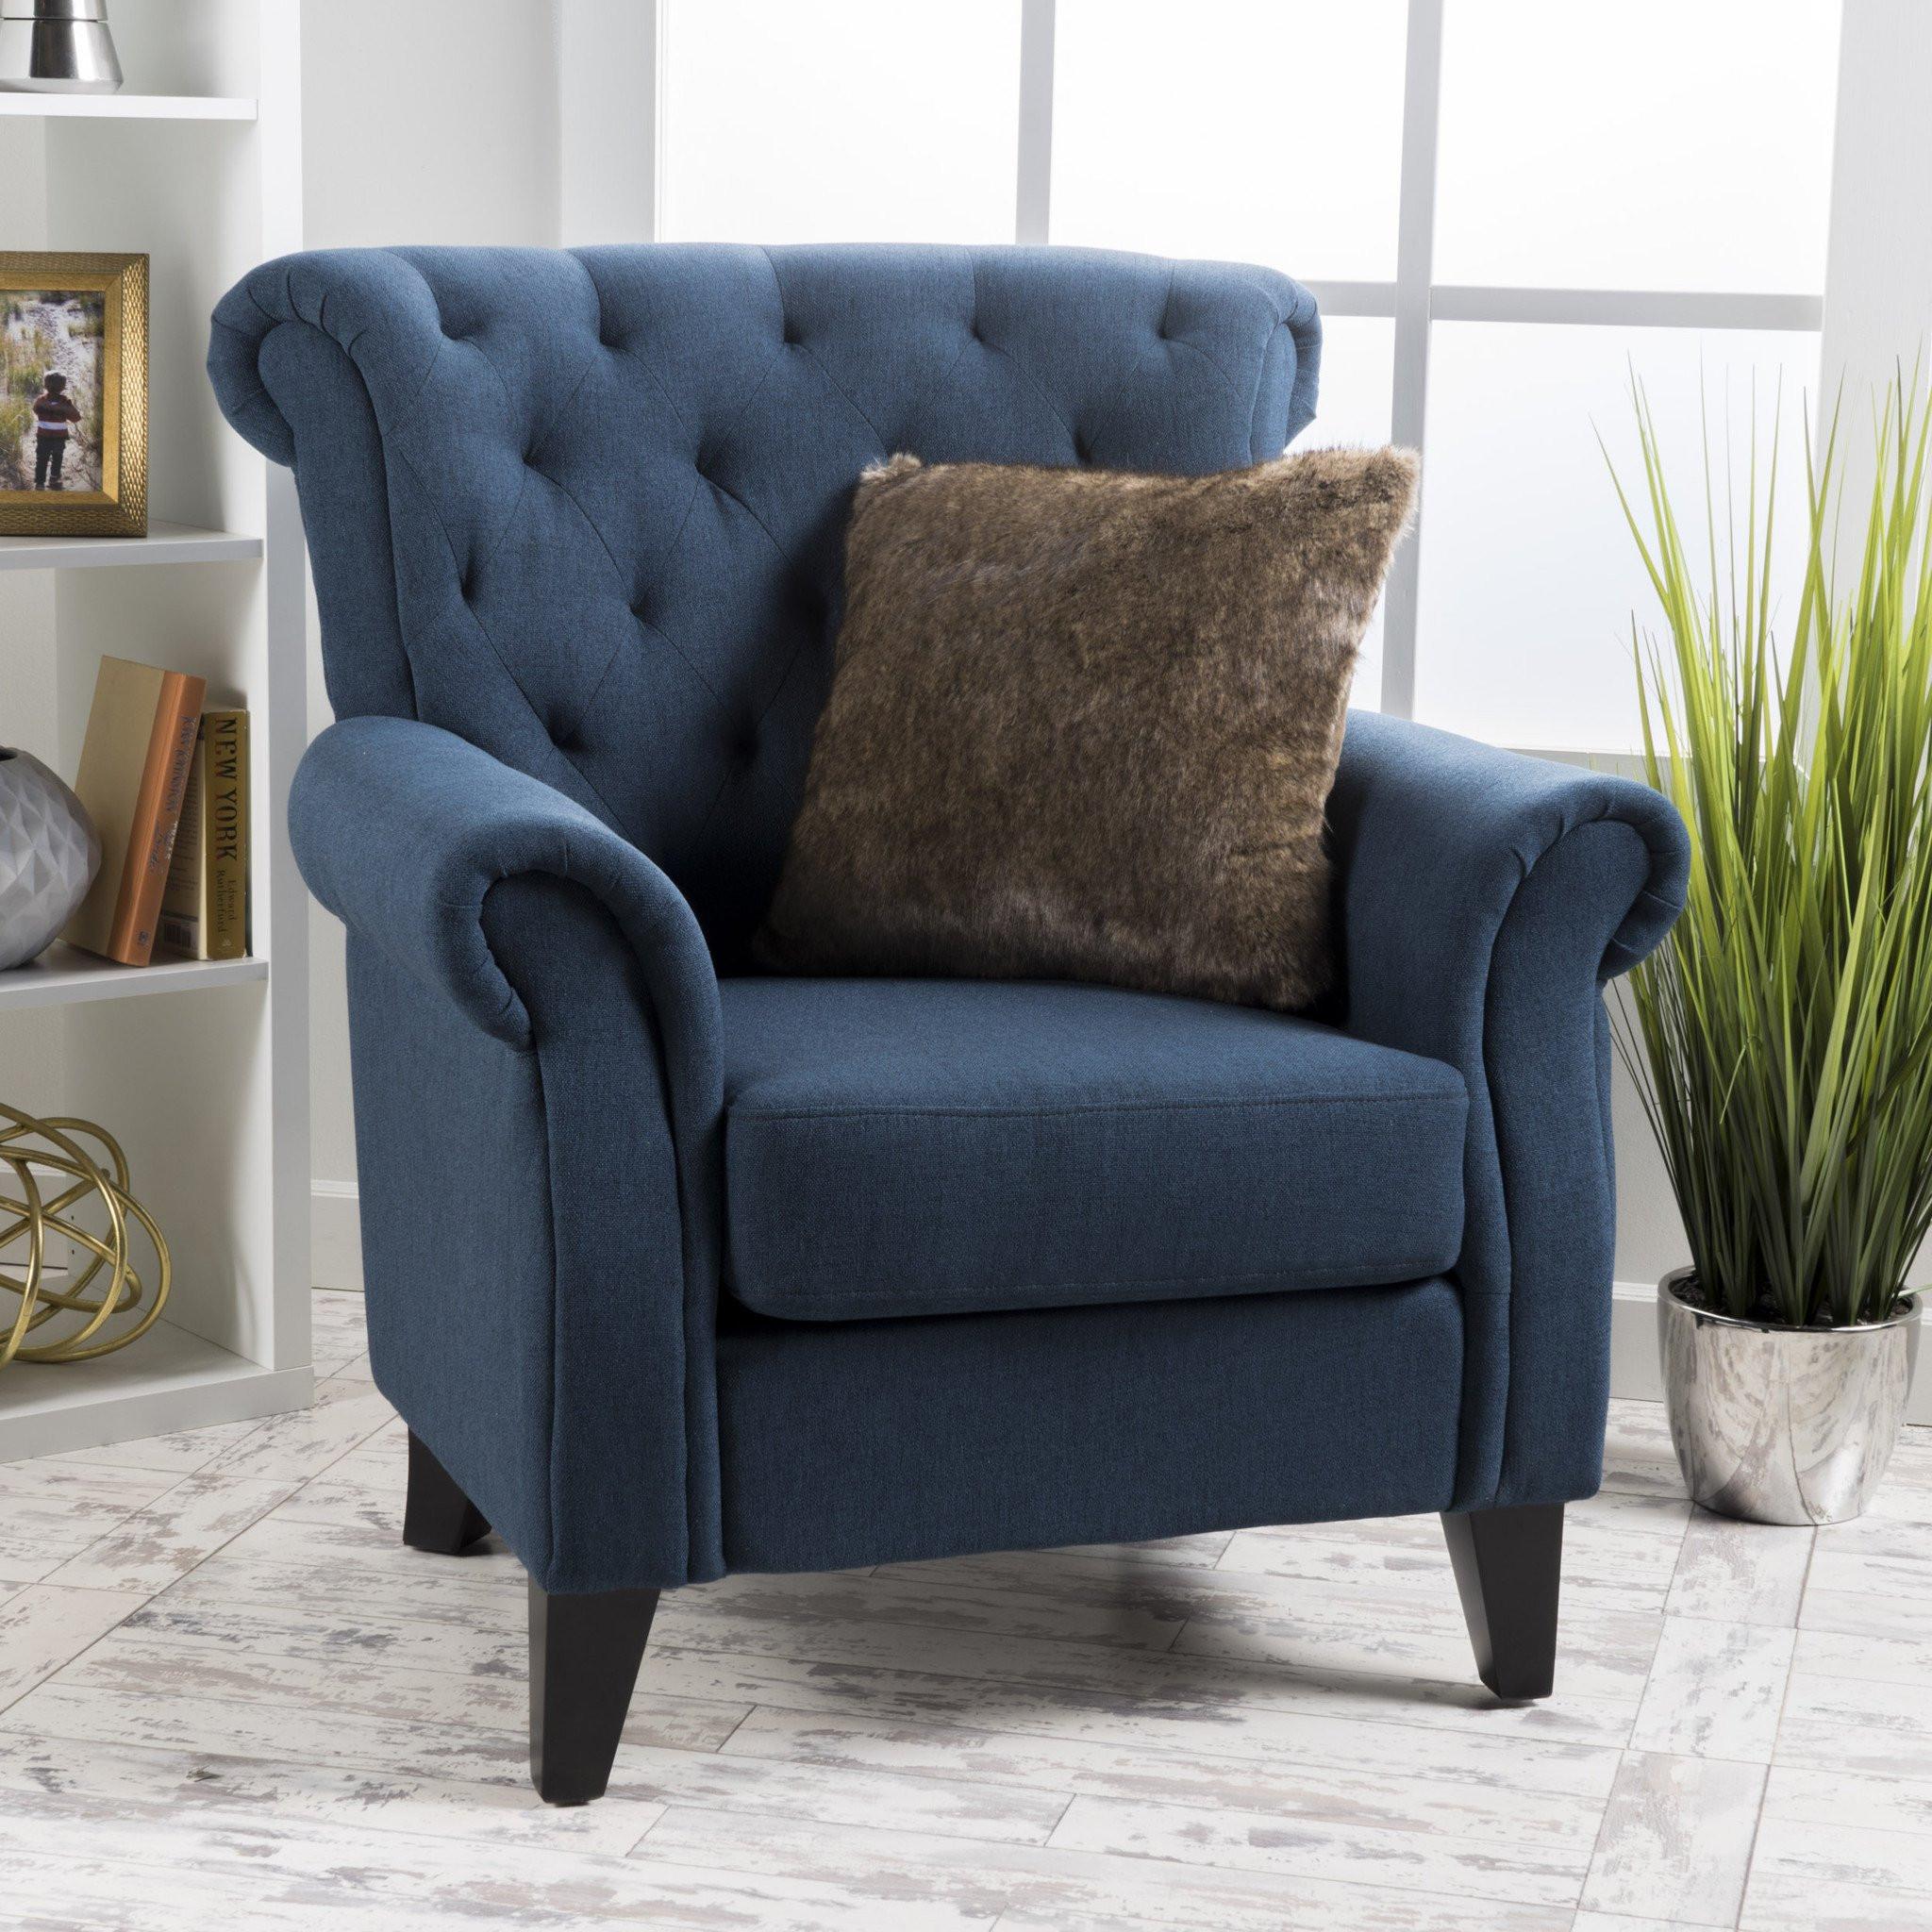 Alpha Tufted Light Beige Fabric Club Chair